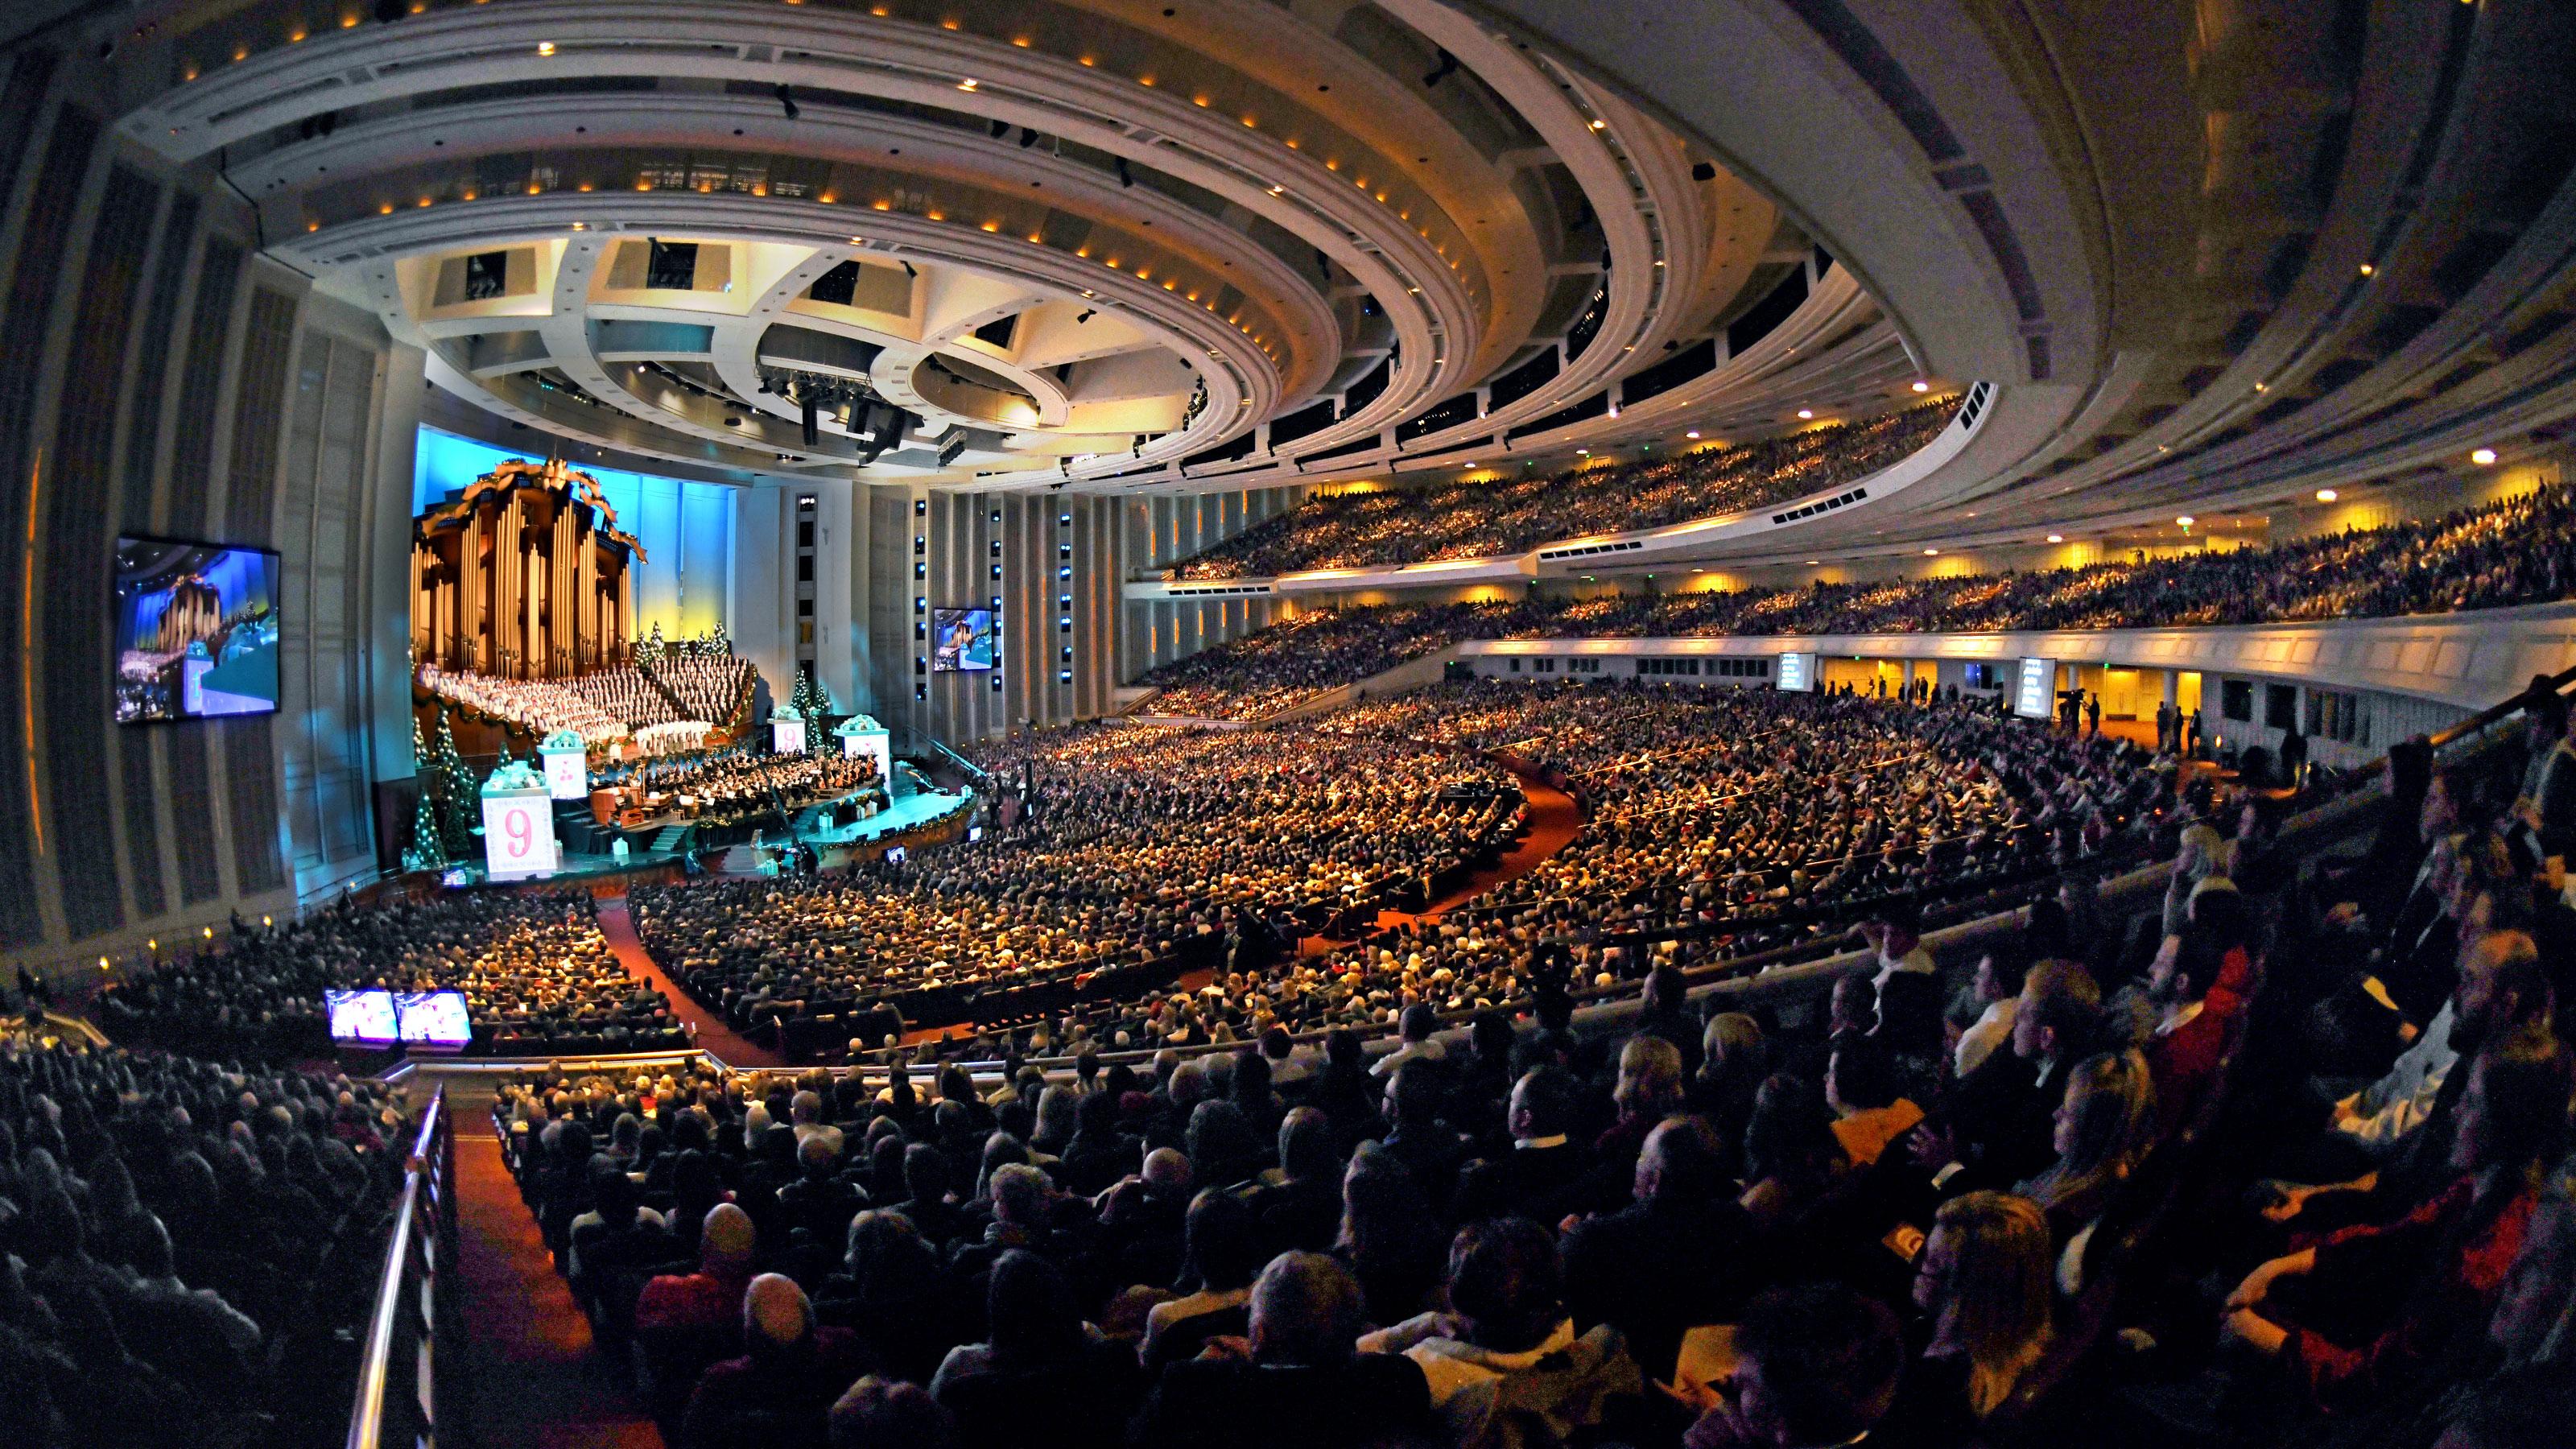 2021 Mormon Tabernacle Choir Christmas Concert Christmas With The Tabernacle Choir About